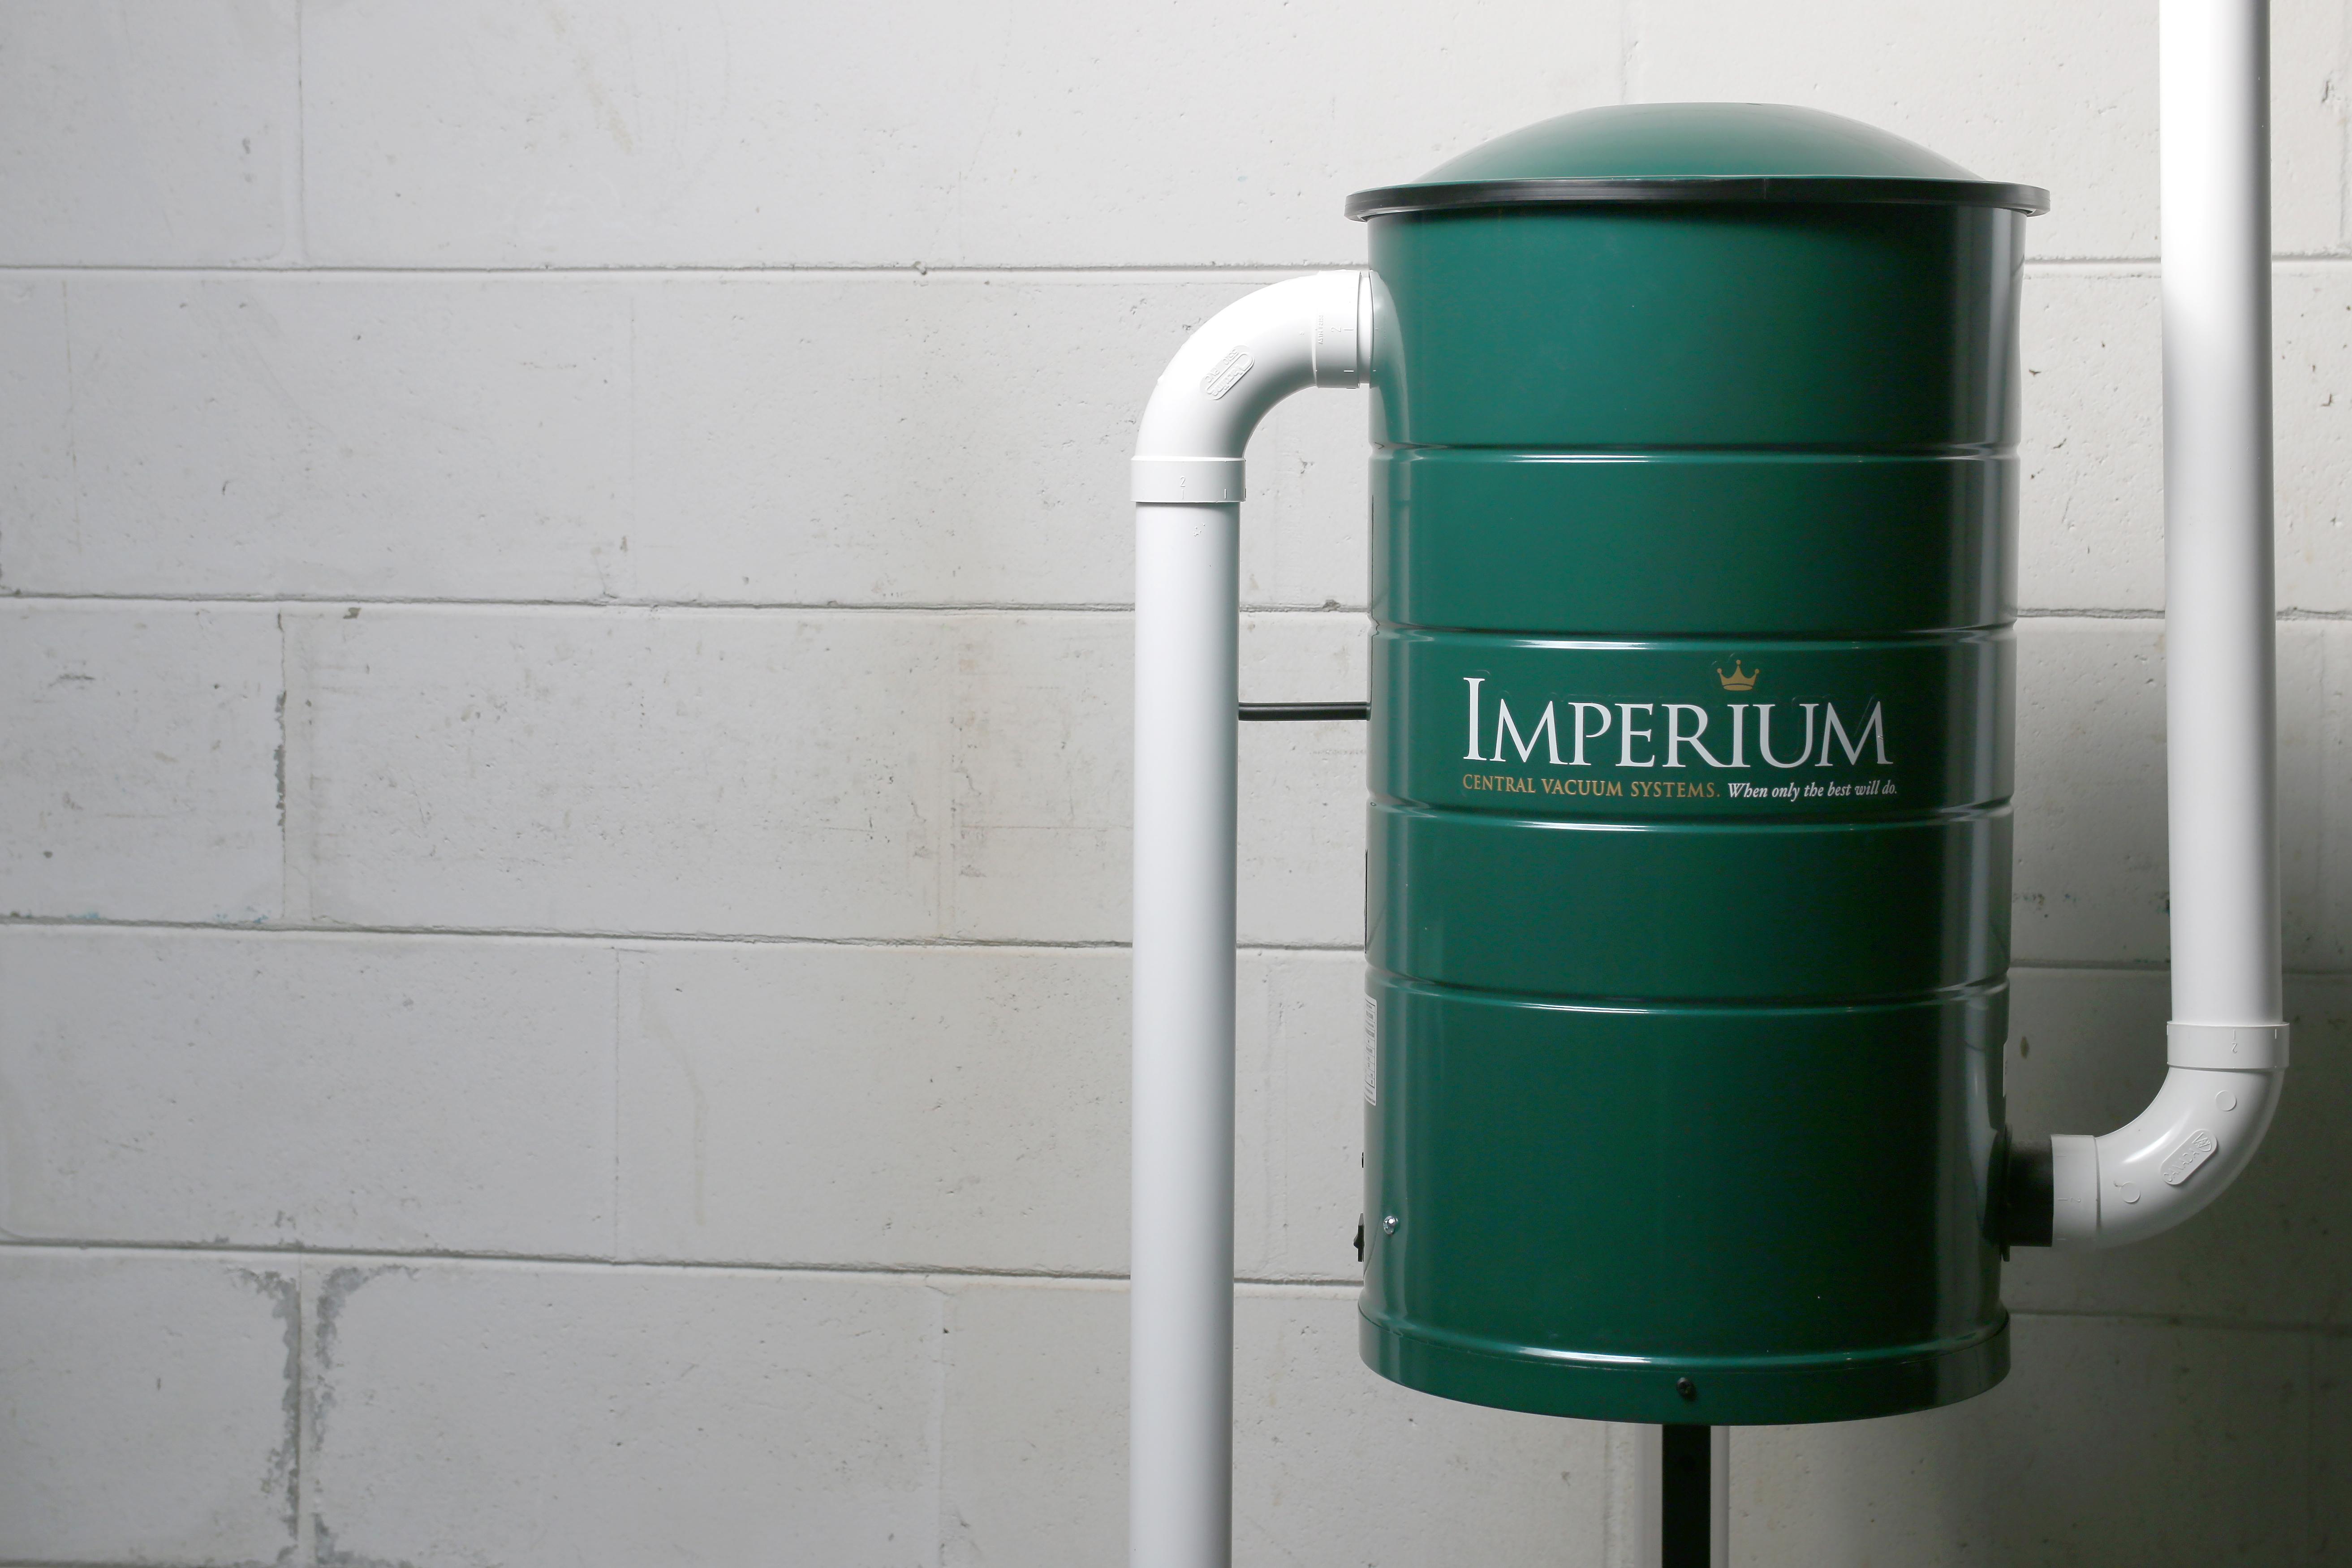 best selling central vacuum system imperium cv300 central vacuum stores. Black Bedroom Furniture Sets. Home Design Ideas